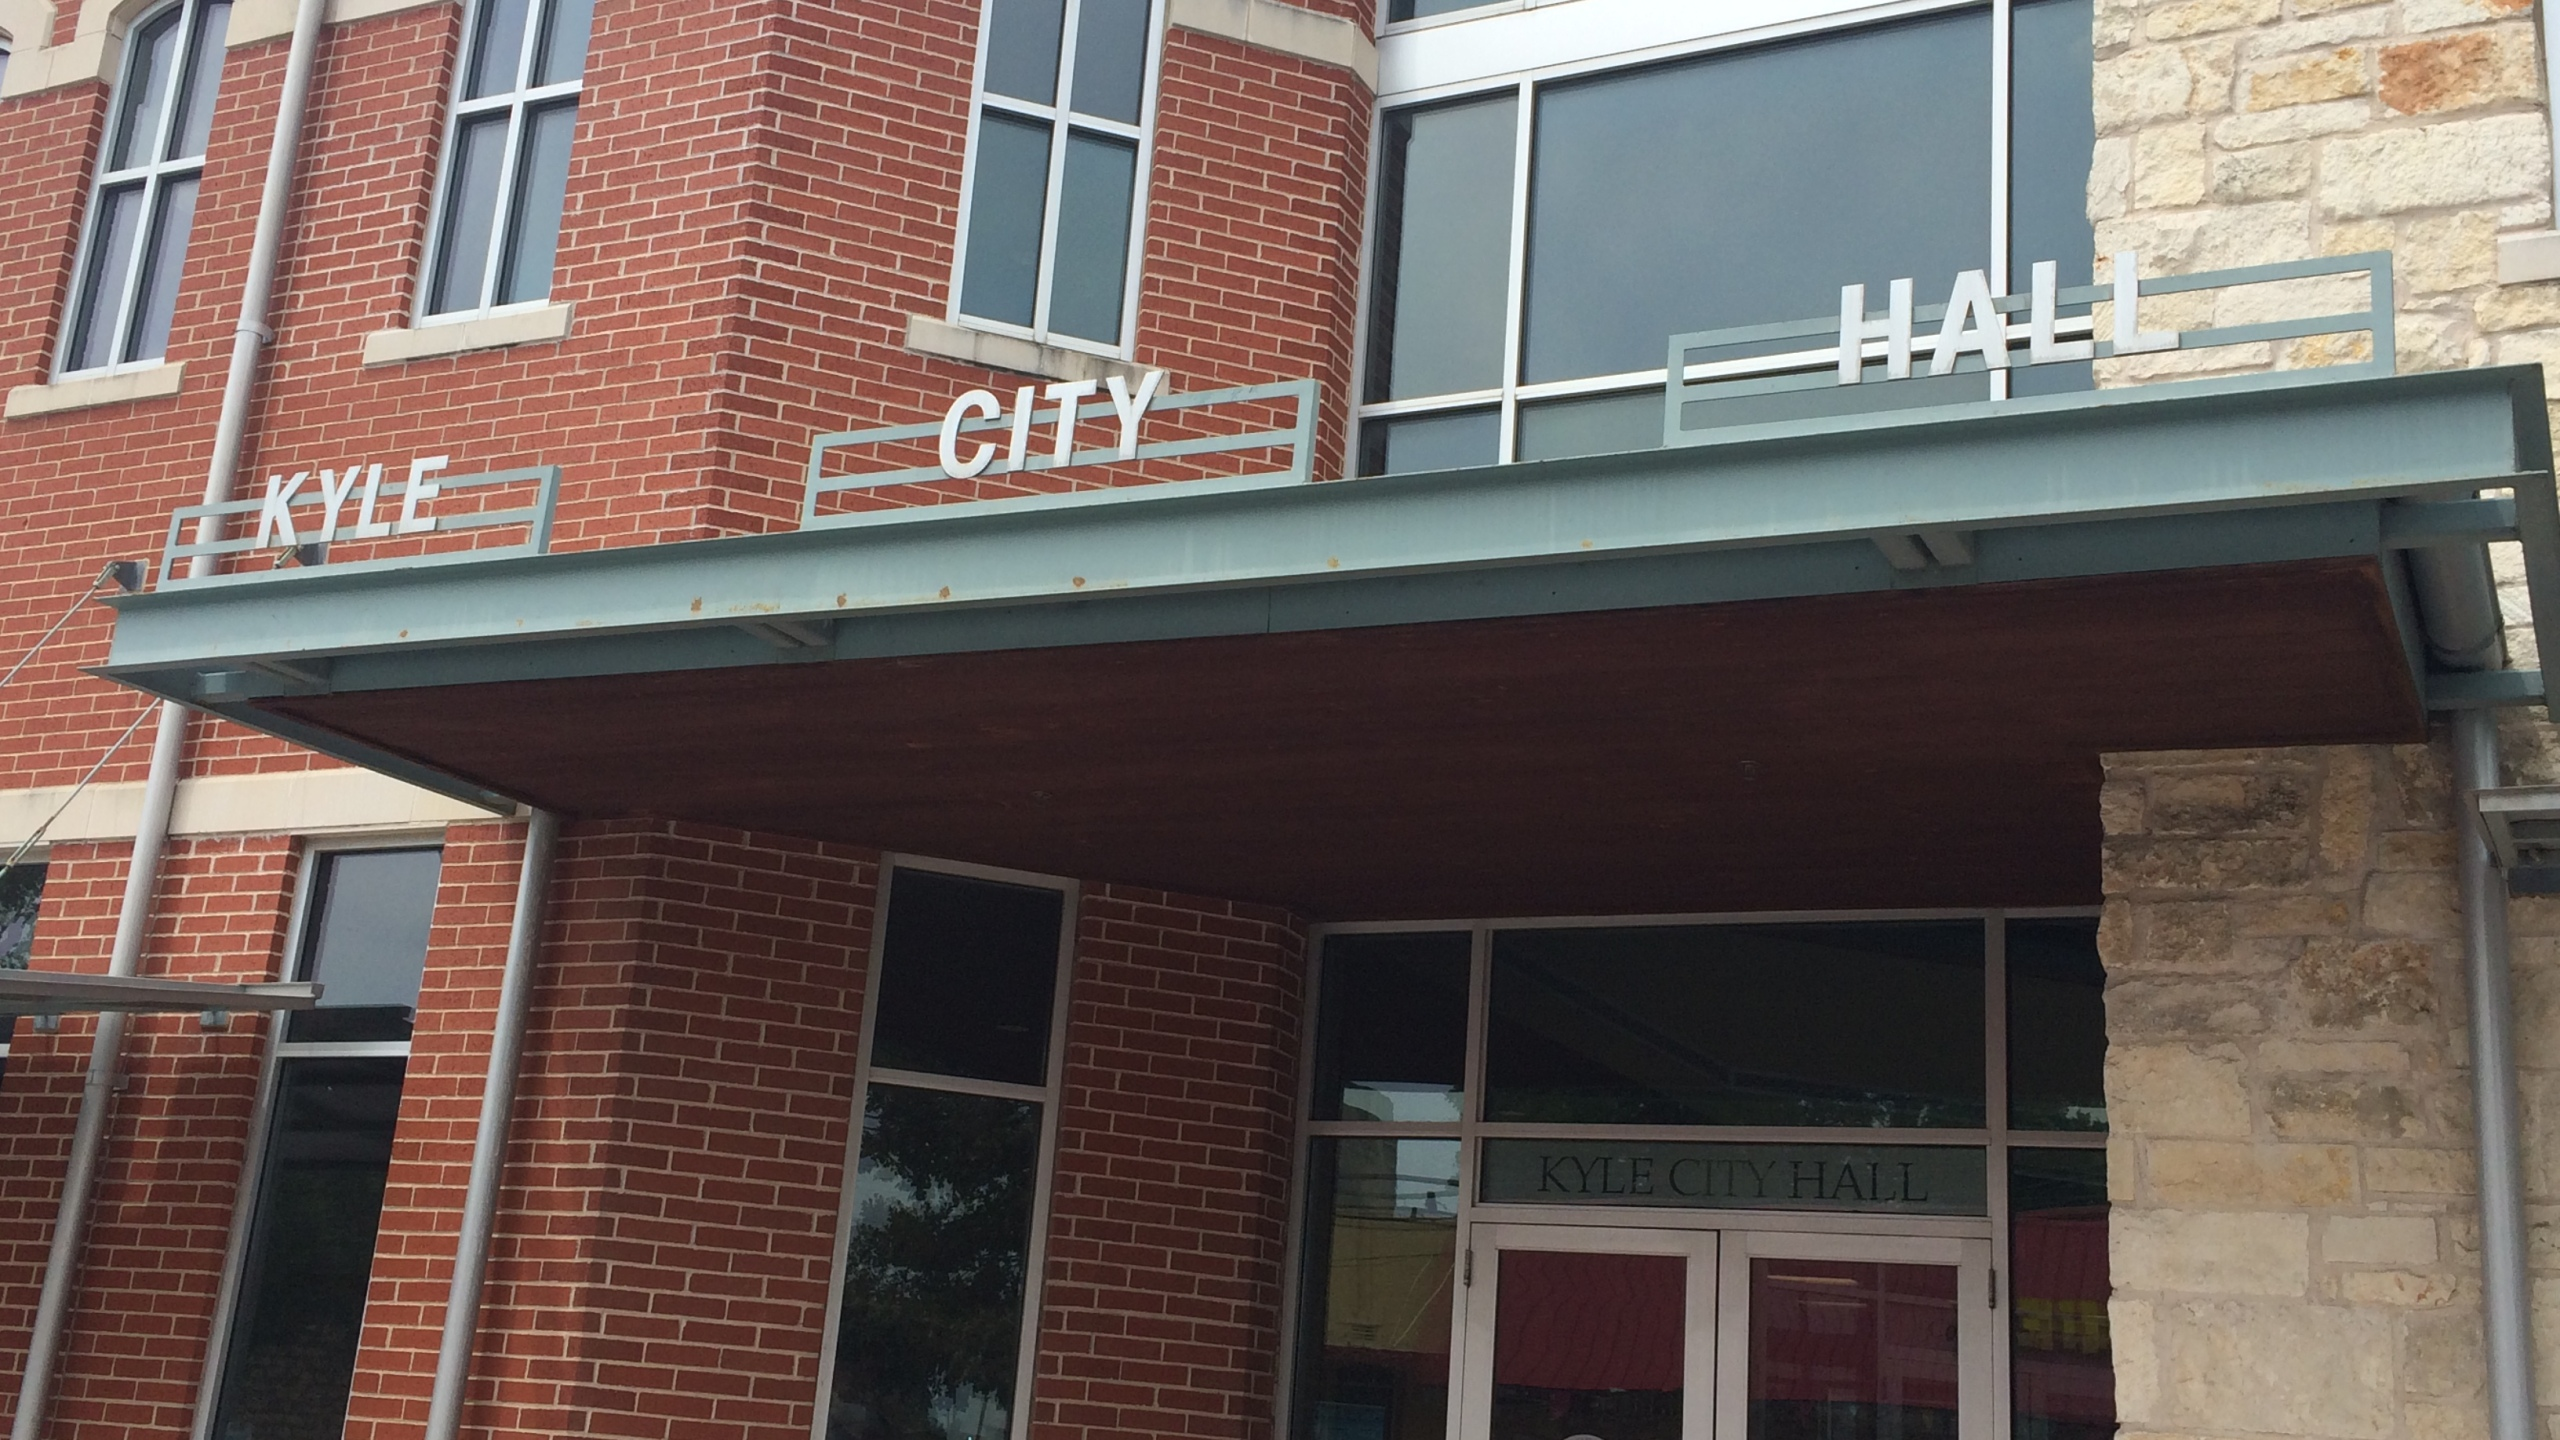 Kyle City Hall_165315